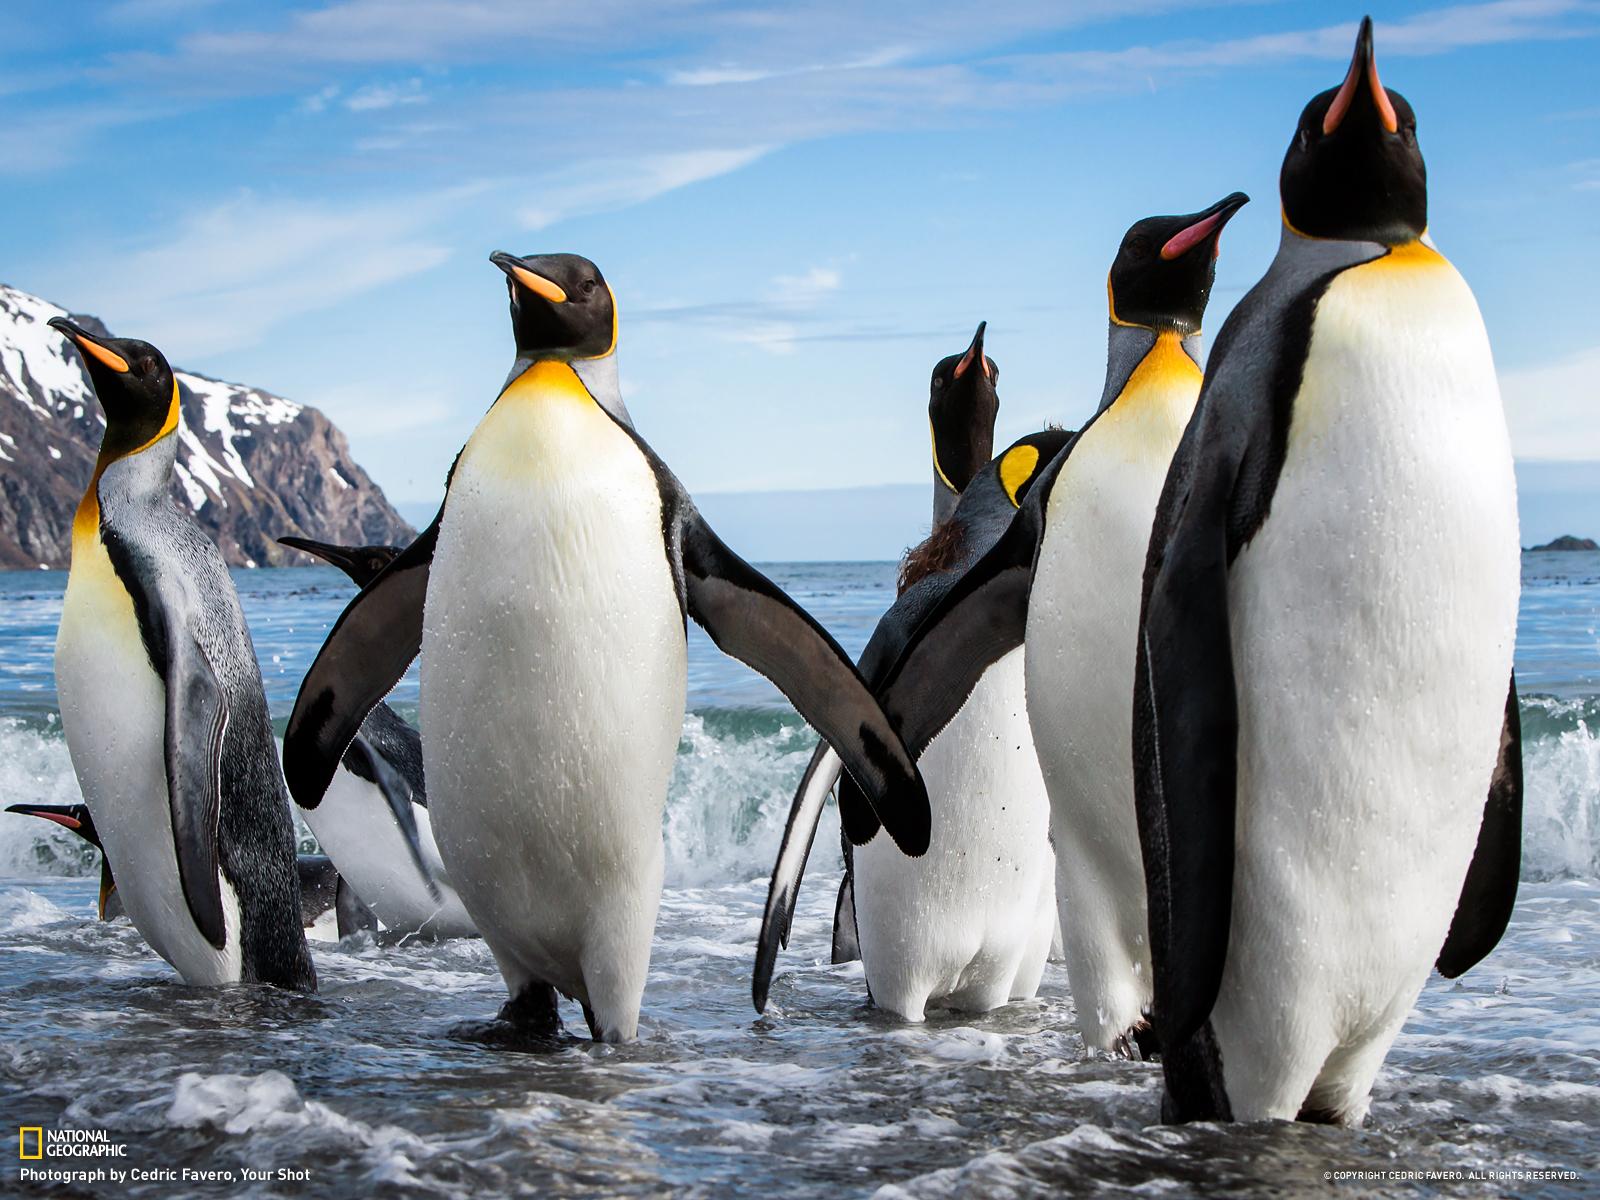 King penguins wallpaper 1600x1200 13511 1600x1200